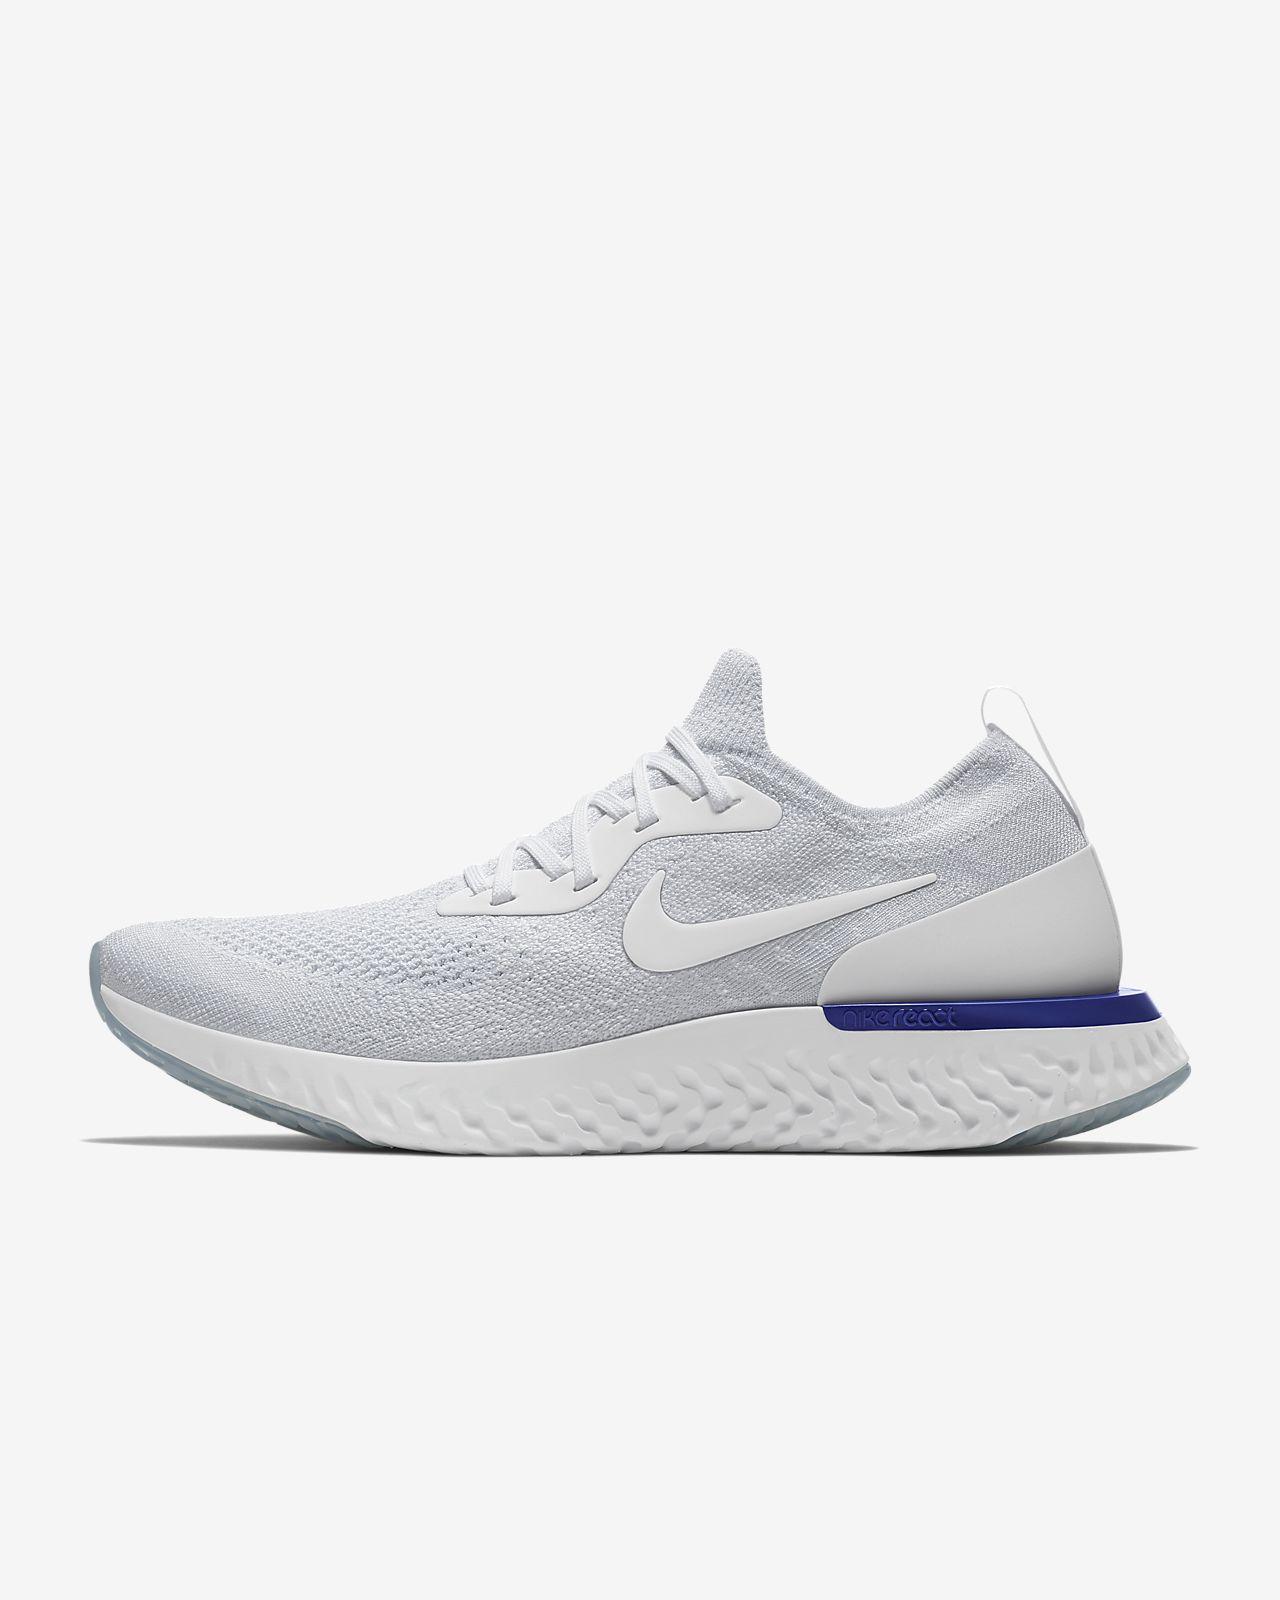 Nike Epic React Flyknit [AQ0067-100] Men Running Shoes White/White-Racer Blue